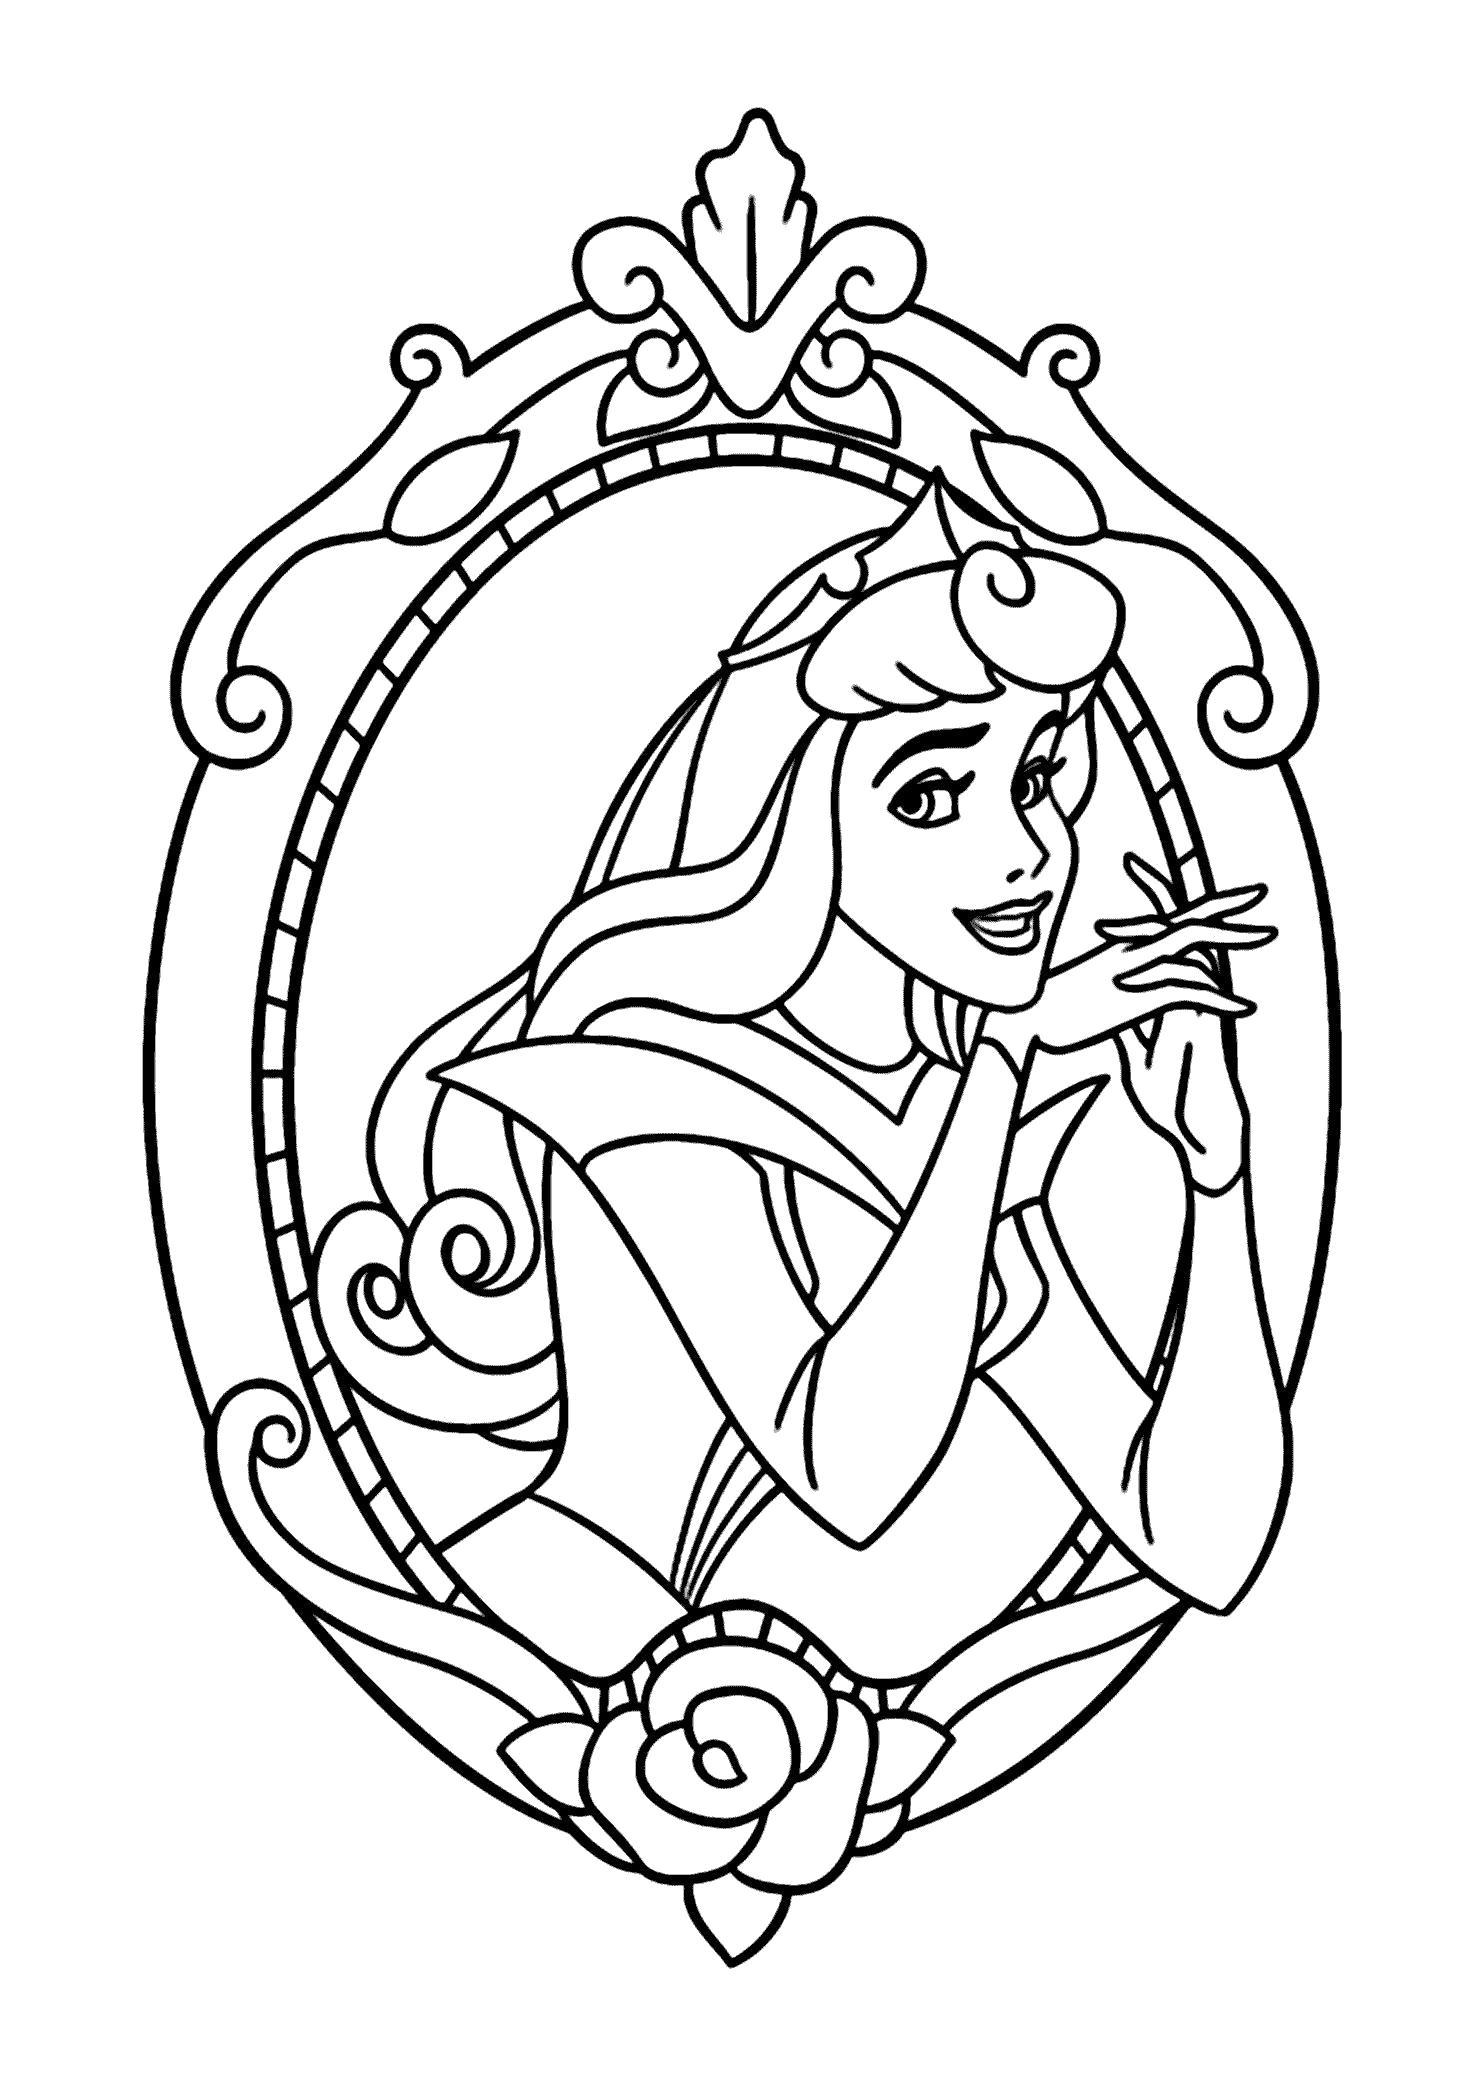 Раскраска Принцесса в зеркале. Скачать принцесса.  Распечатать принцесса